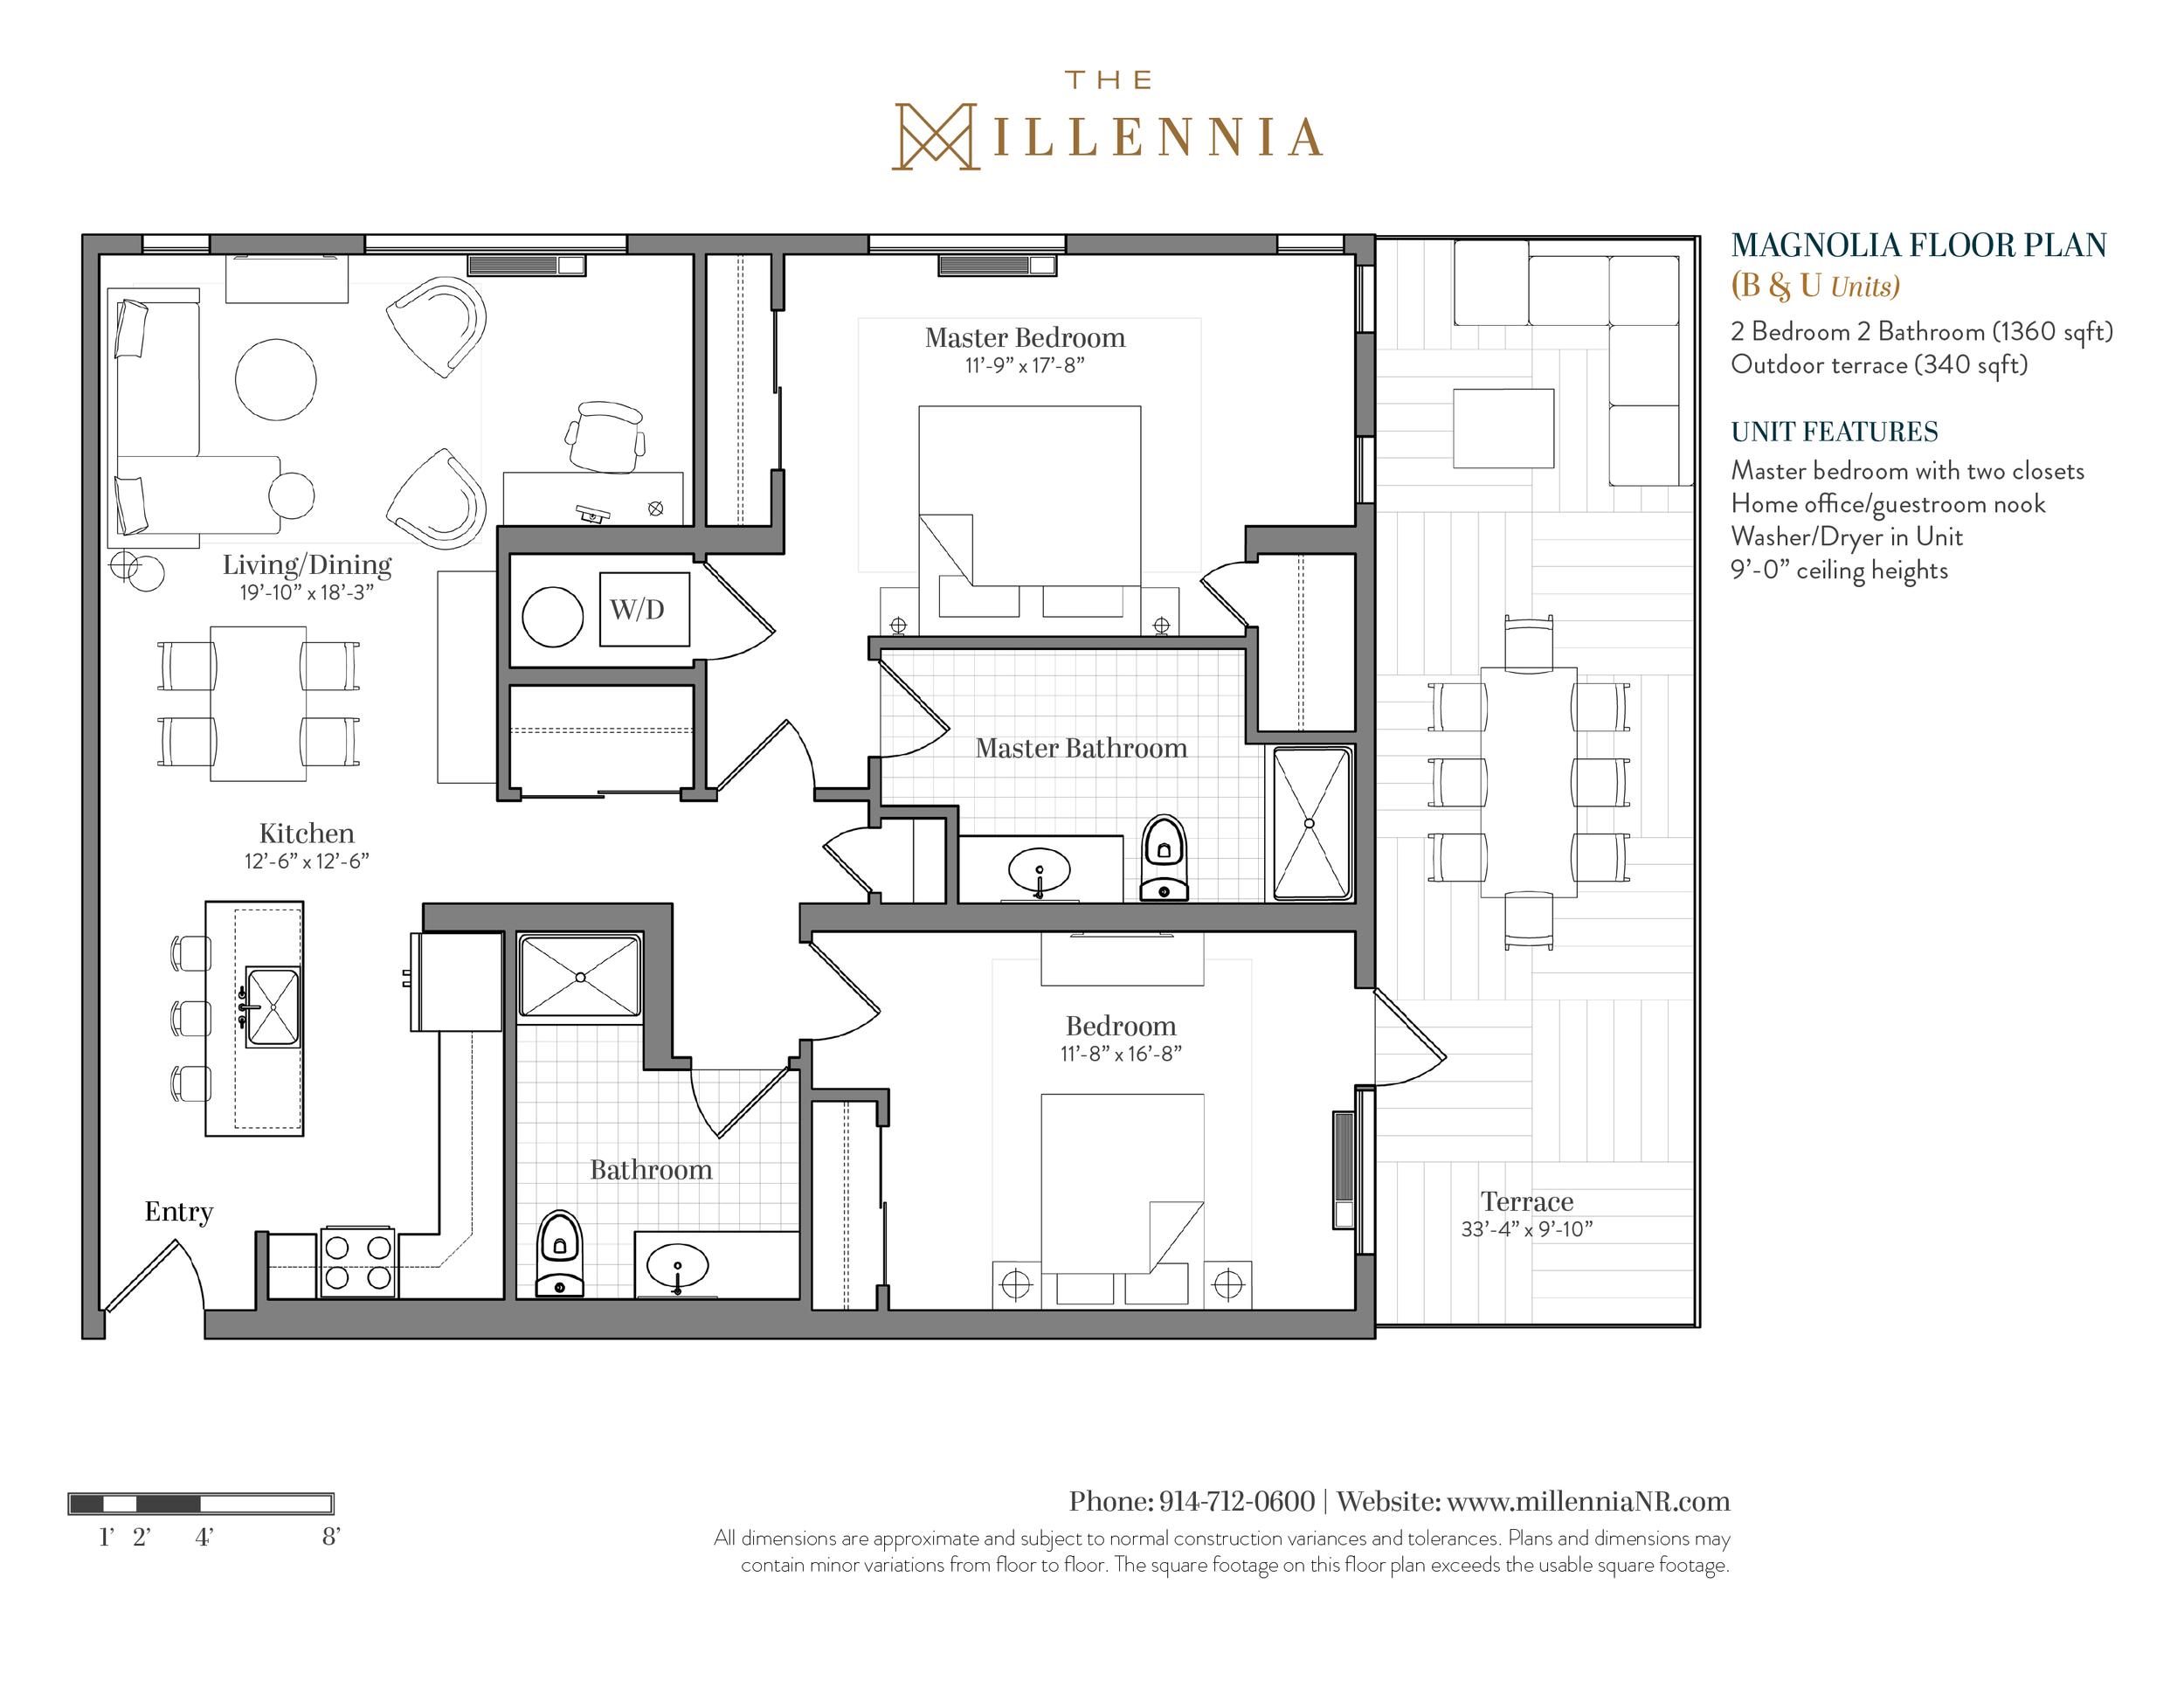 Millennia_Floorplans_Magnolia.png